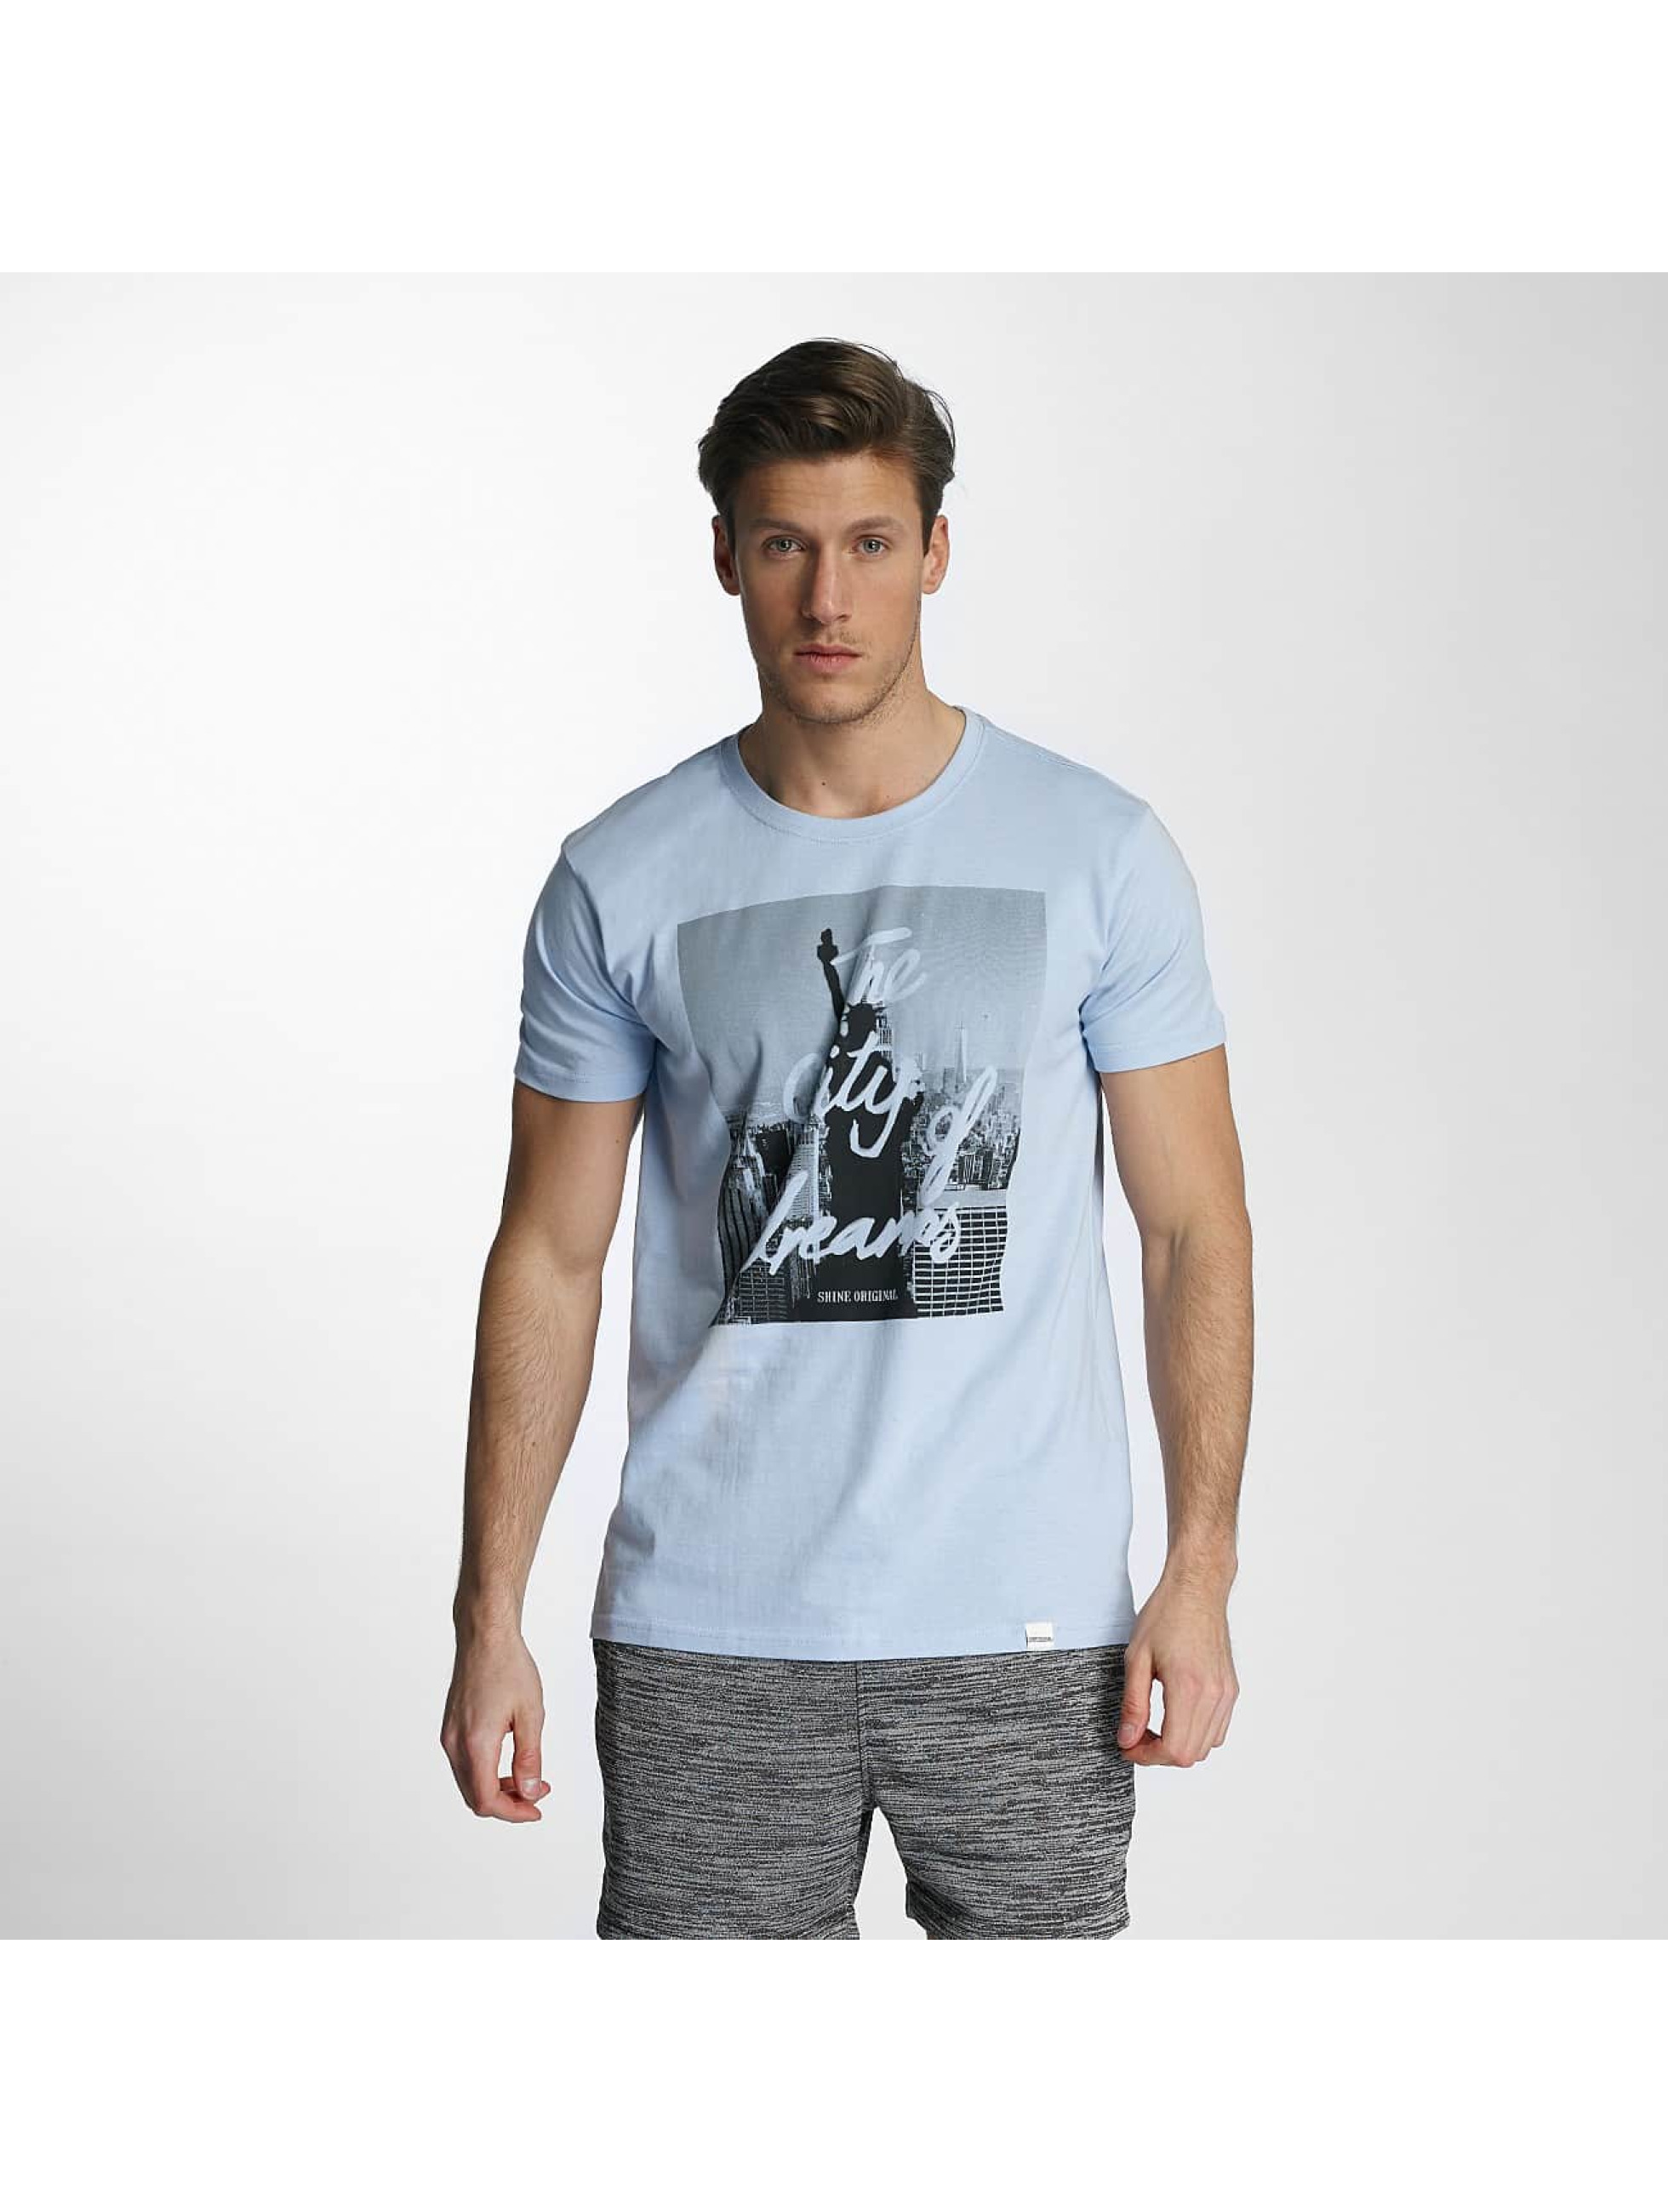 SHINE Original T-Shirt City Lane blau